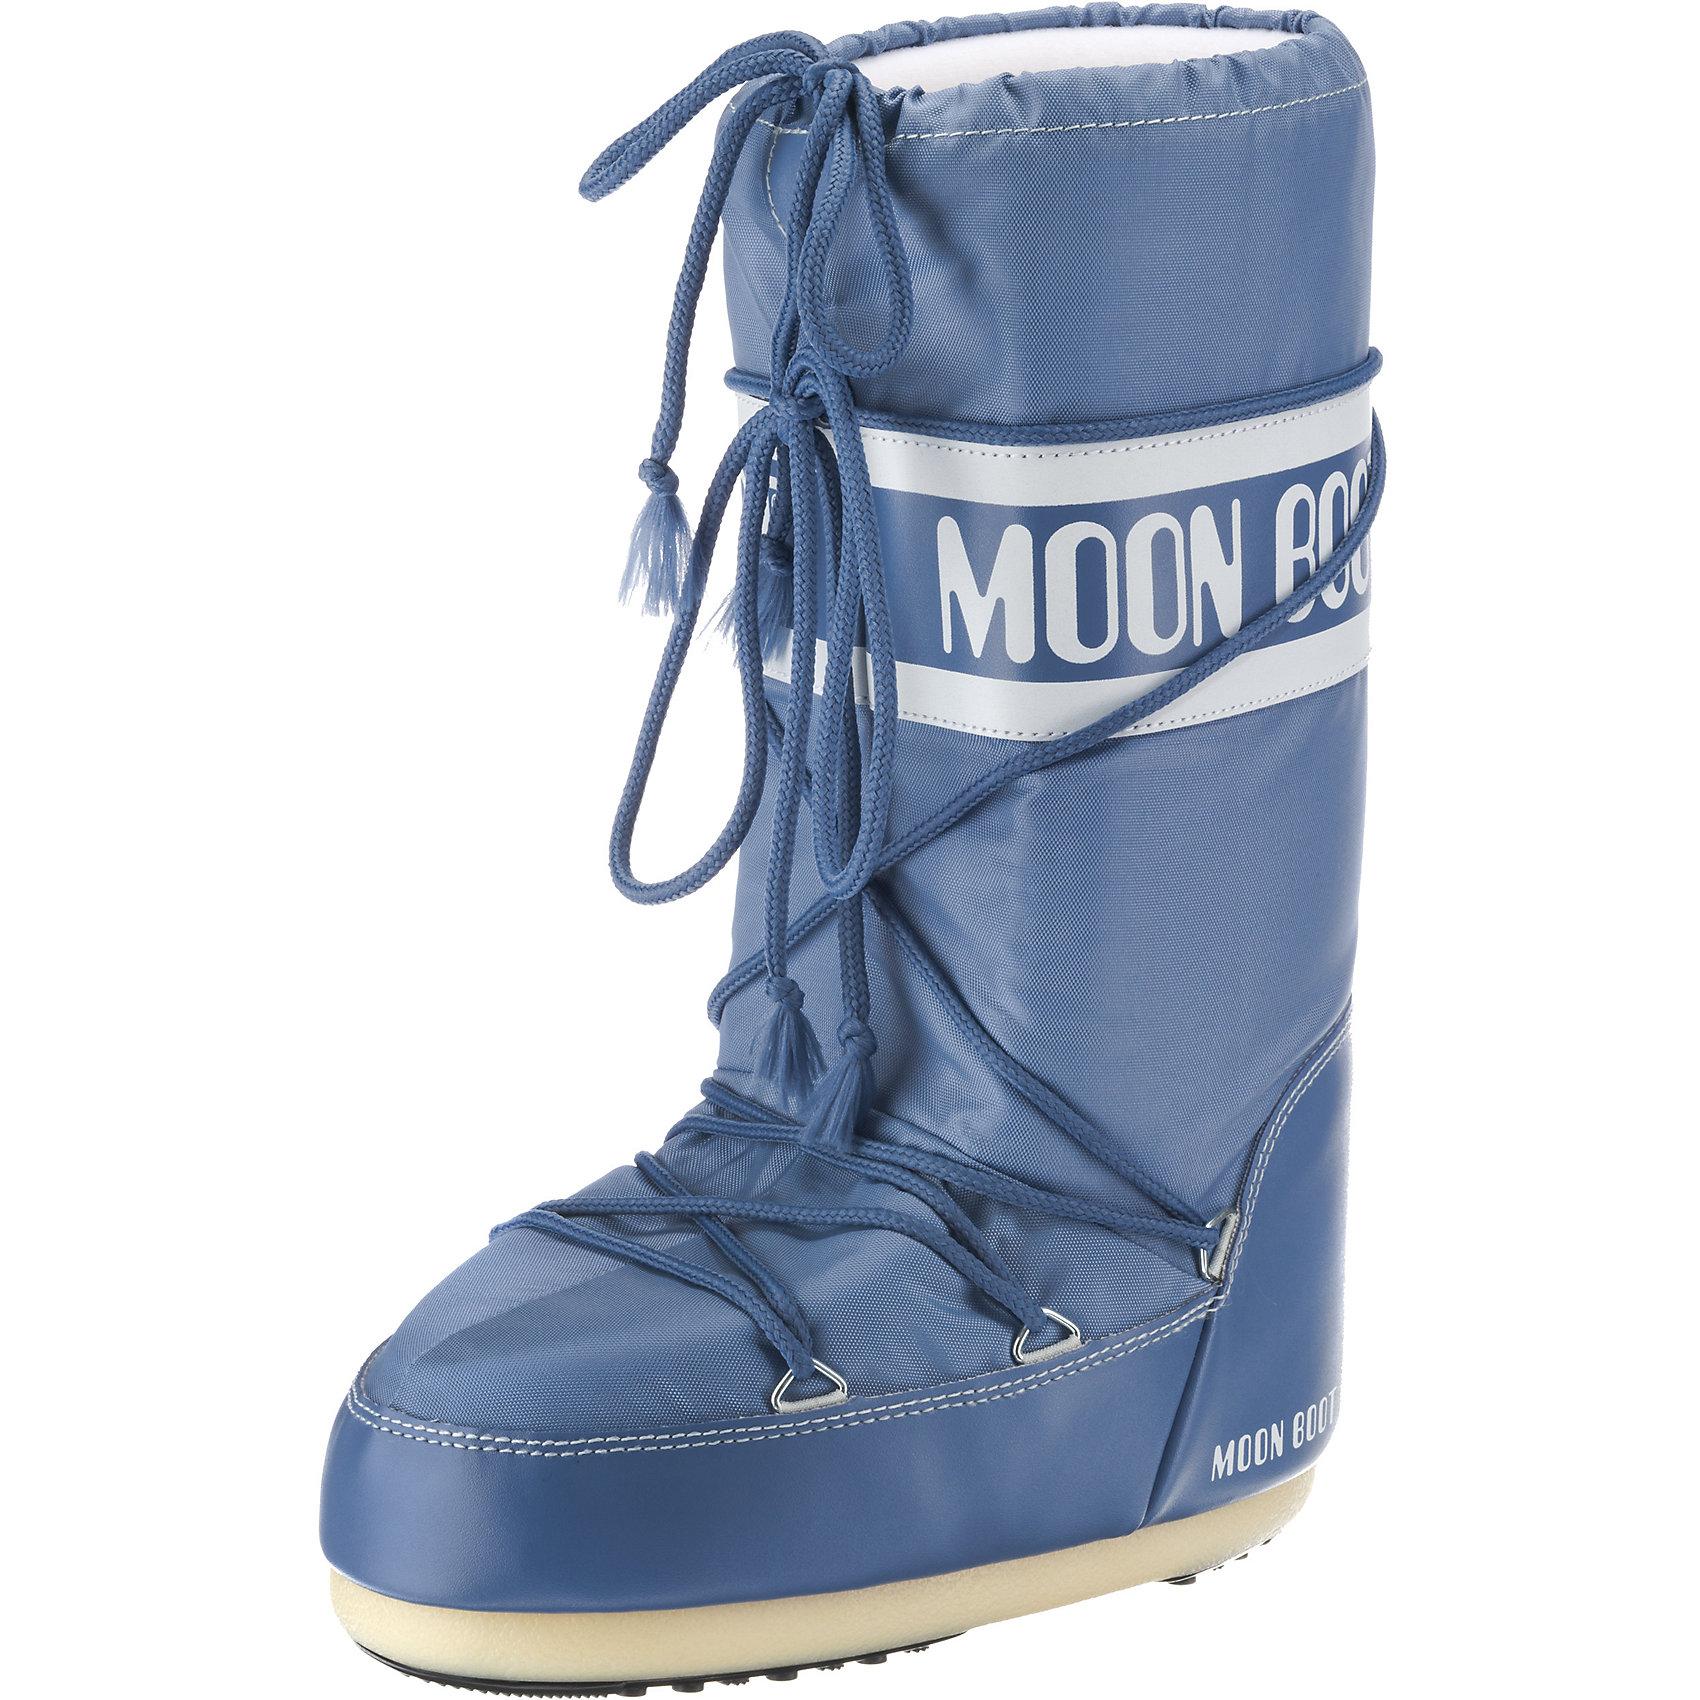 Für Boot Moon Moonboot Nylon Damen Neu 8674535 Winterstiefel WEH2YDI9